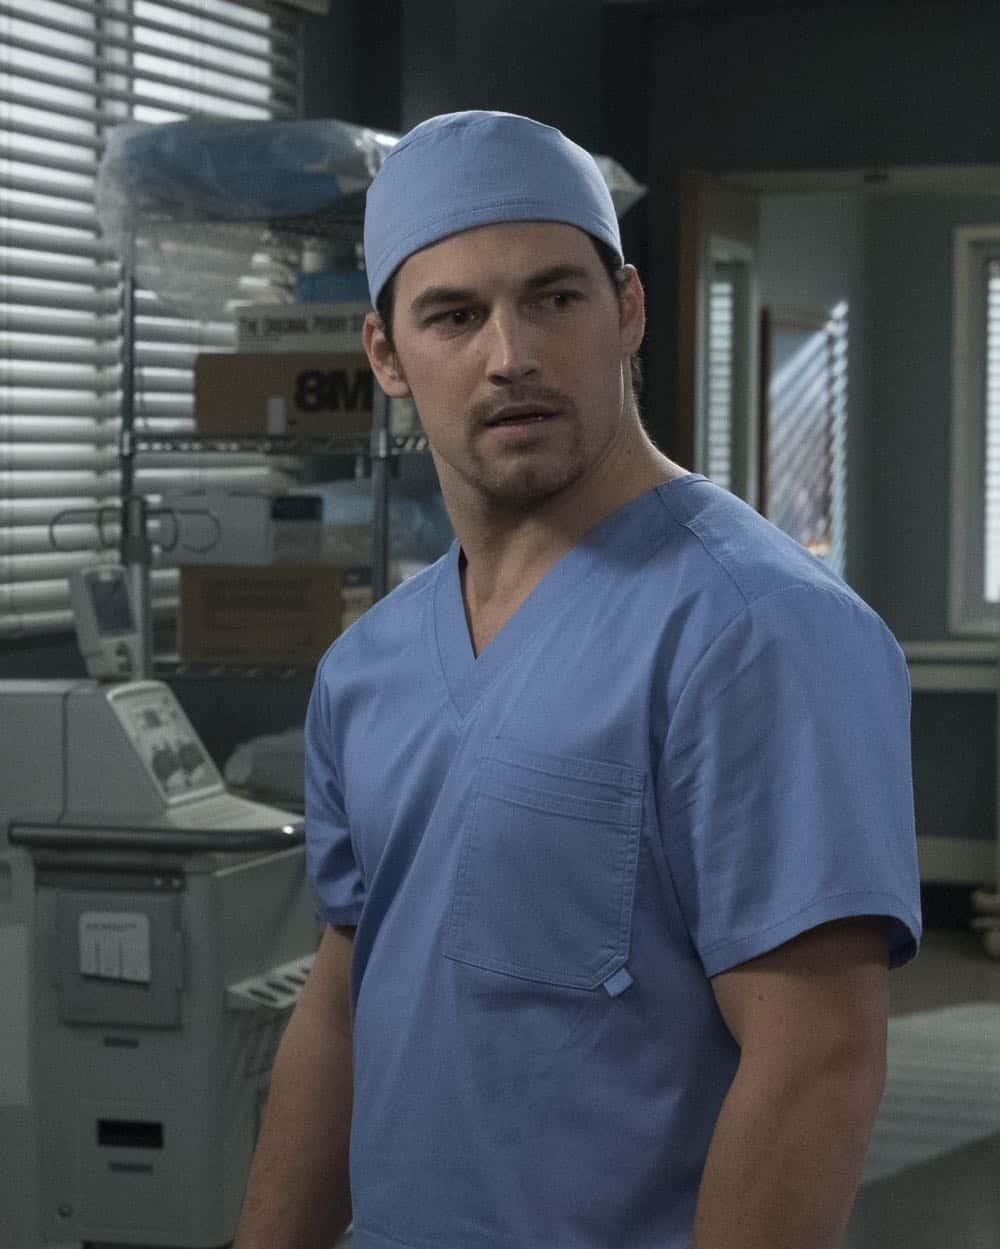 Greys Anatomy Episode 19 Season 14 Beautiful Dreamer 19